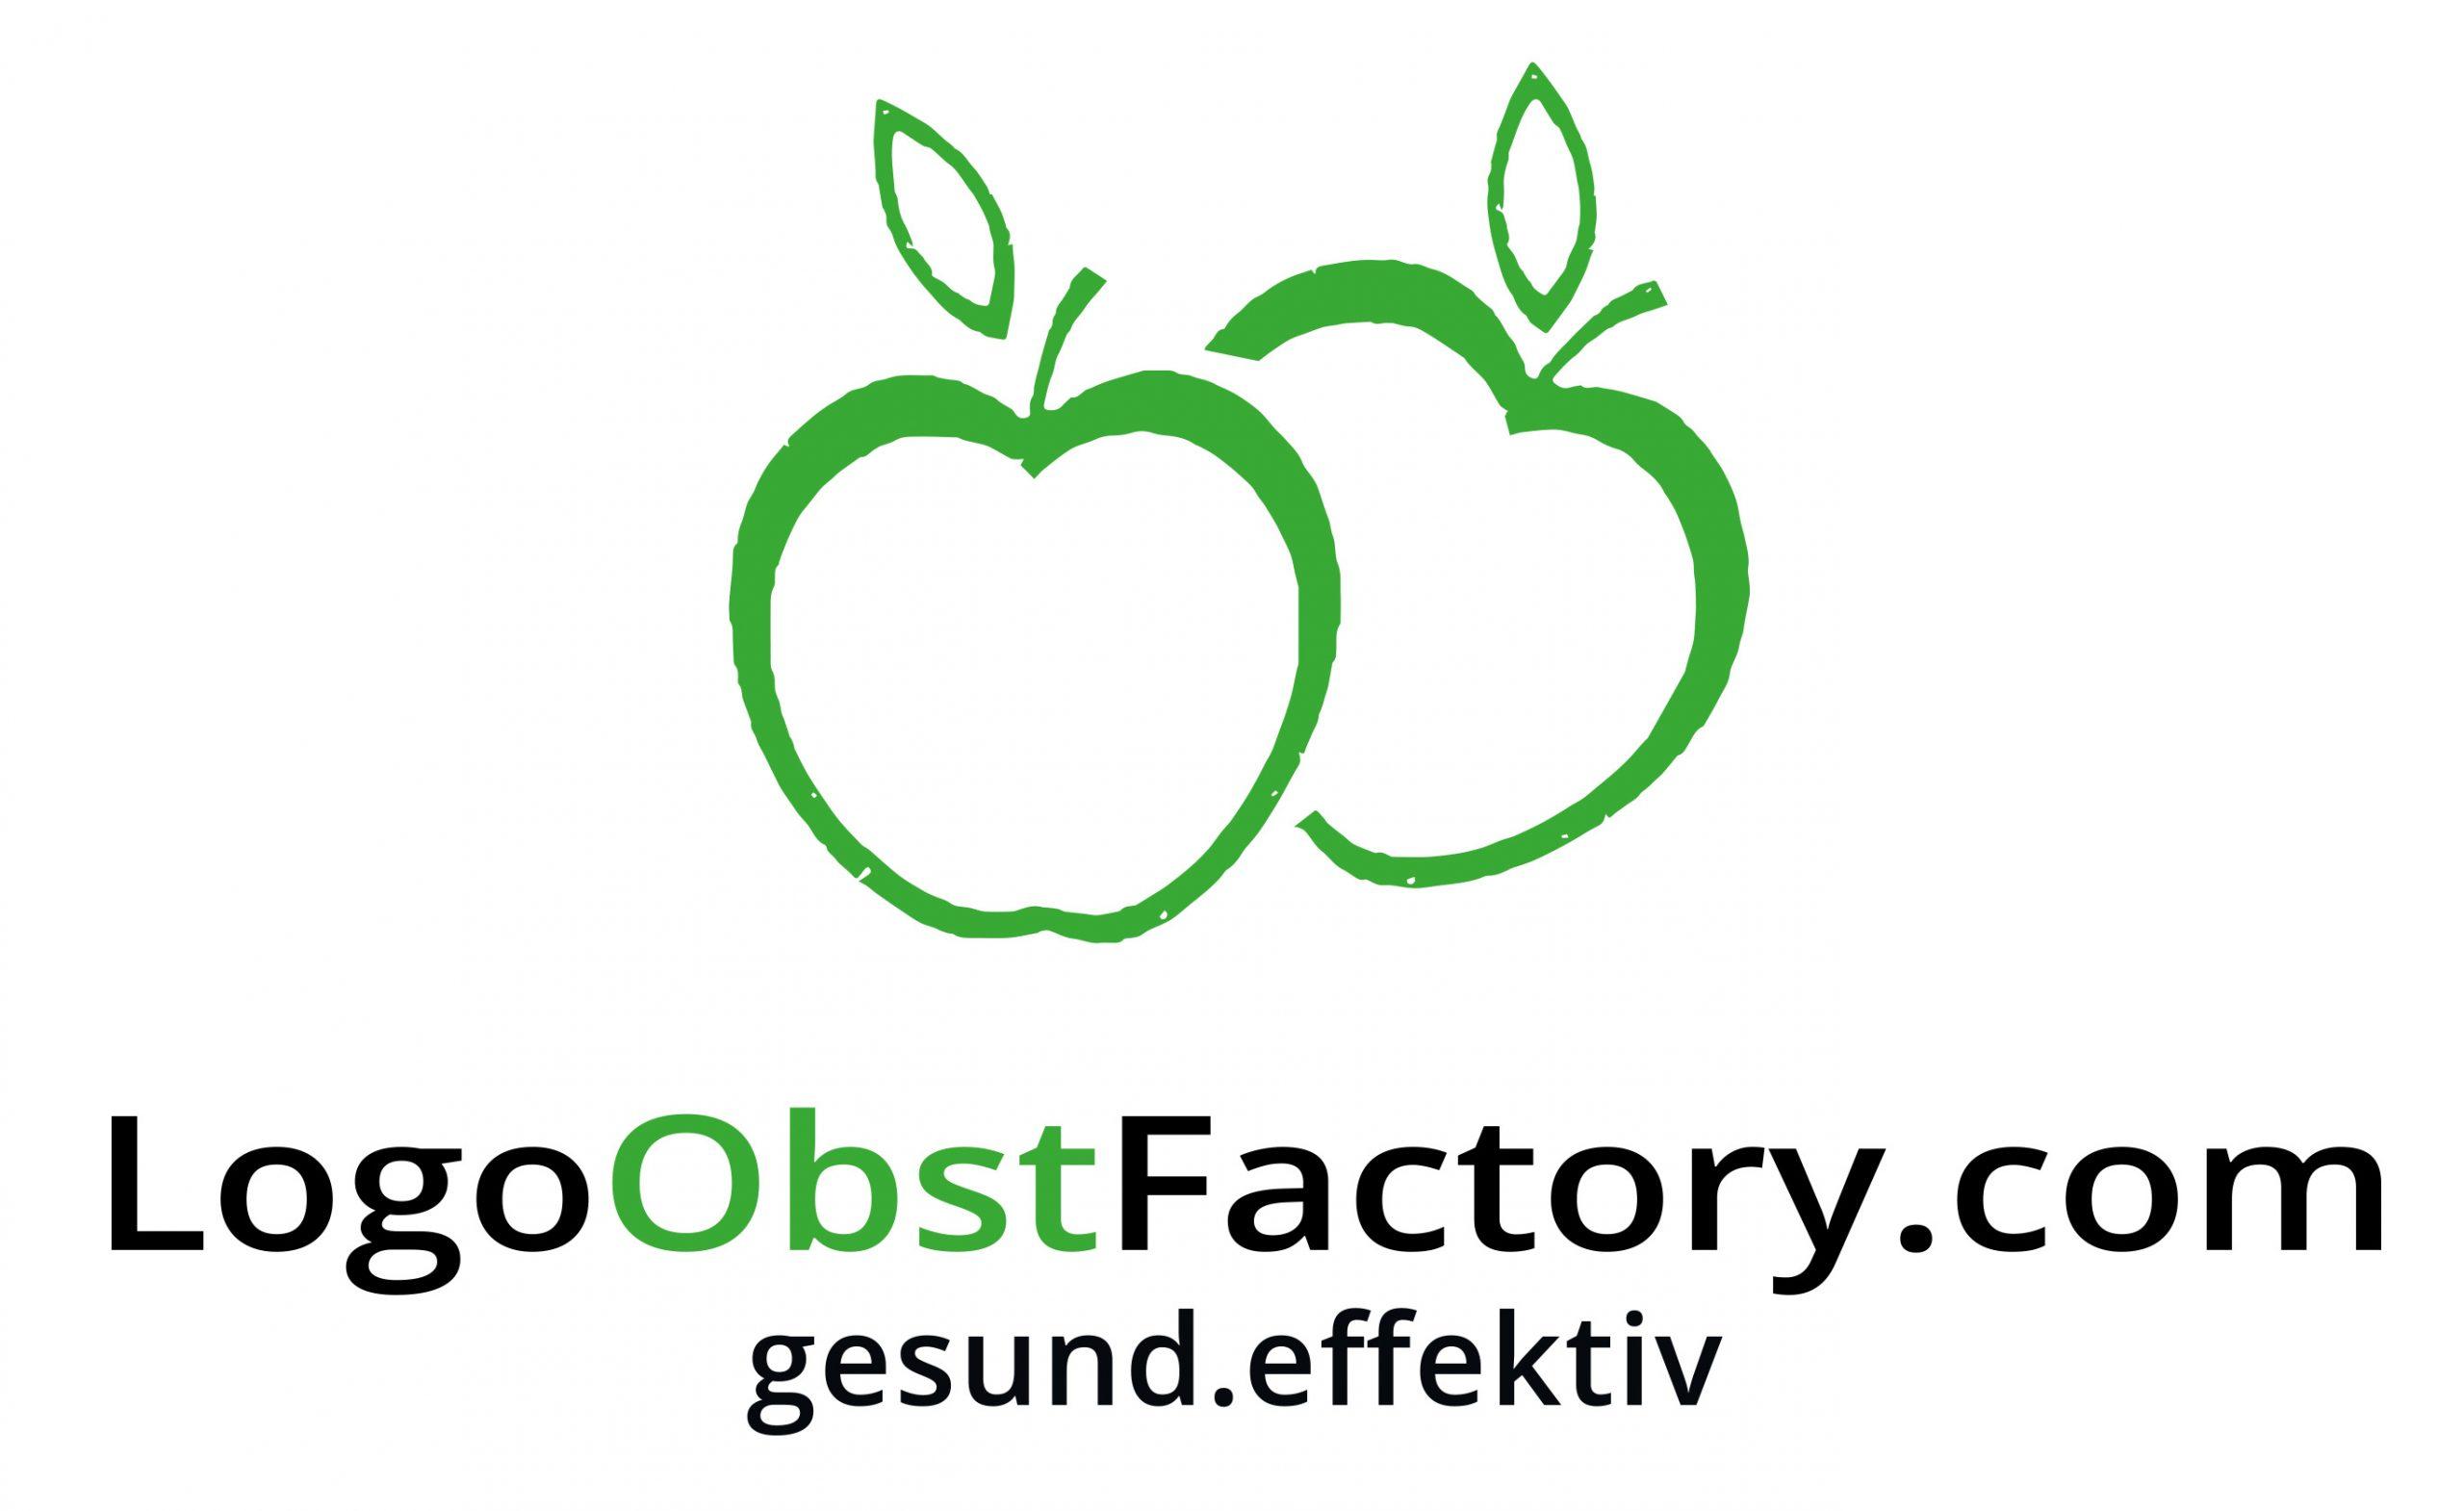 LogoobstFactory.com